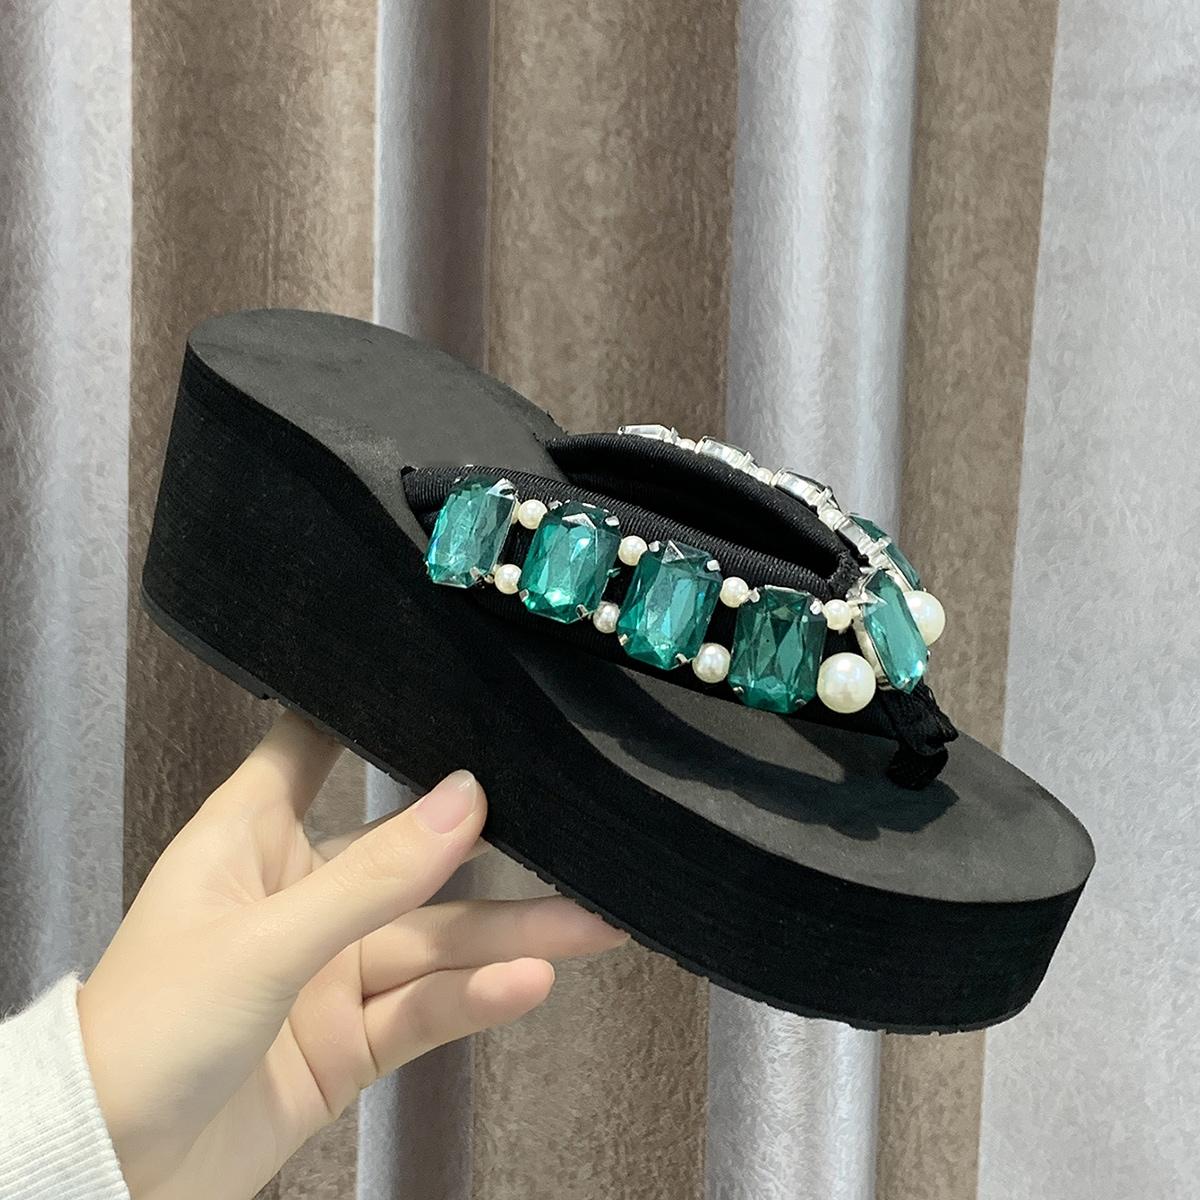 Edelstenen detail dikke zool slippers